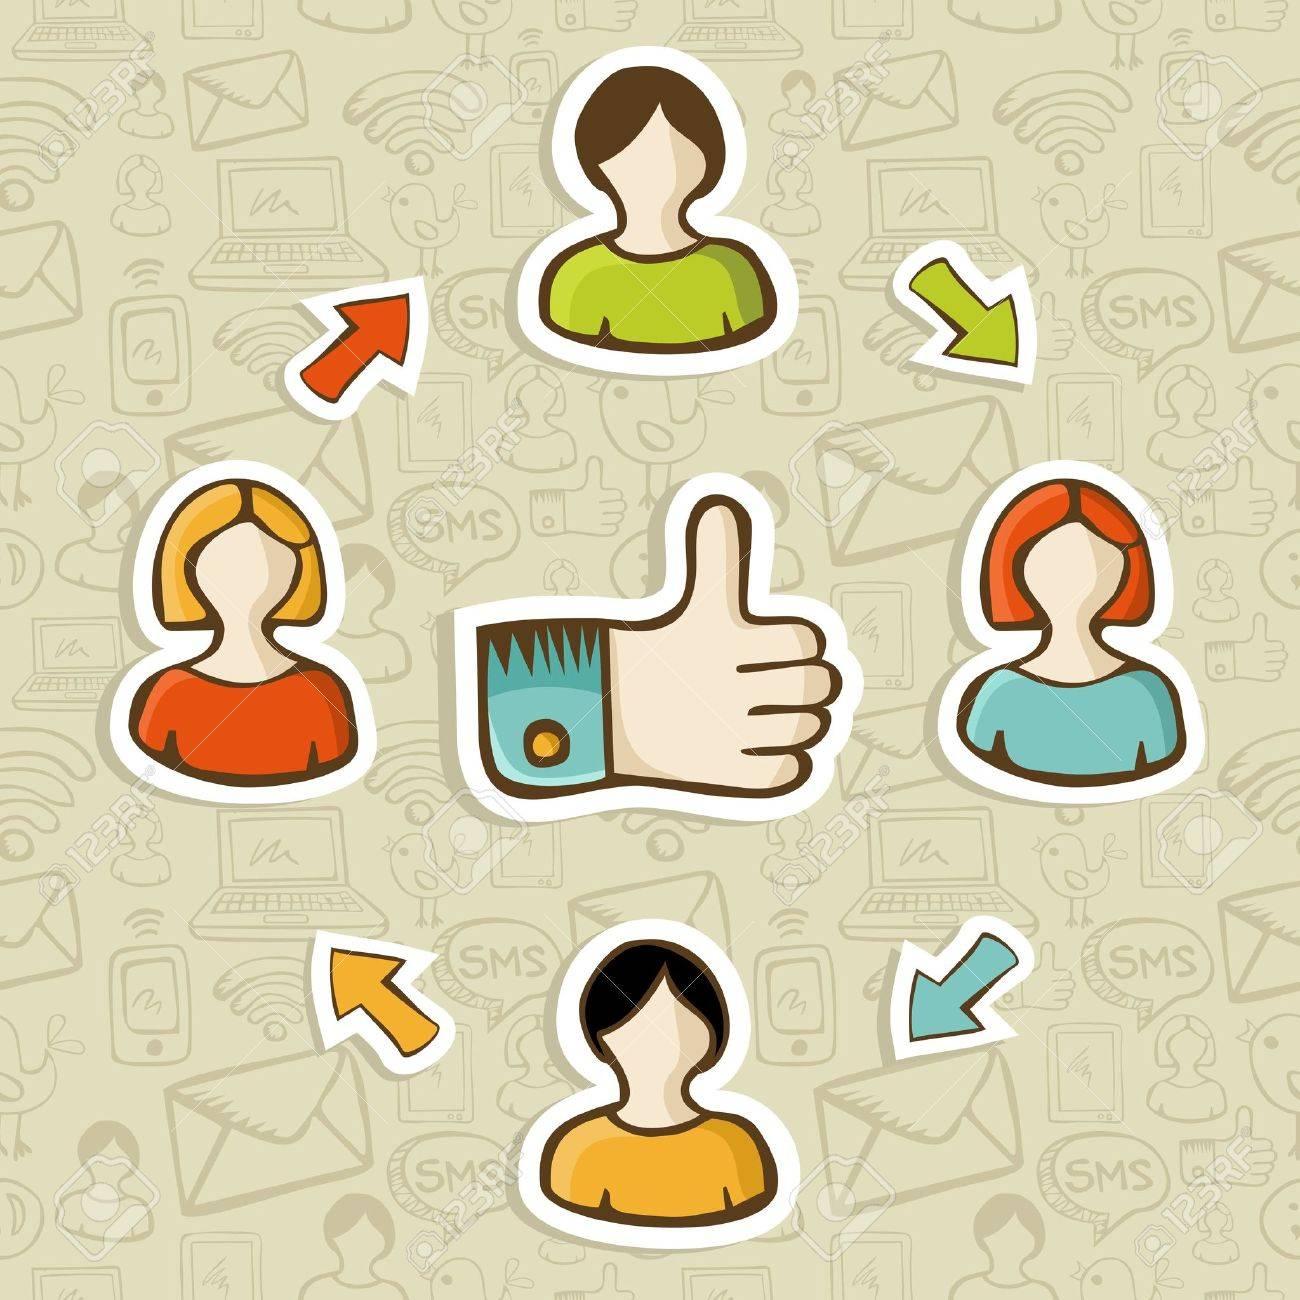 Pulgar Para Arriba Diagrama Amistad Medios De Comunicación Social ...